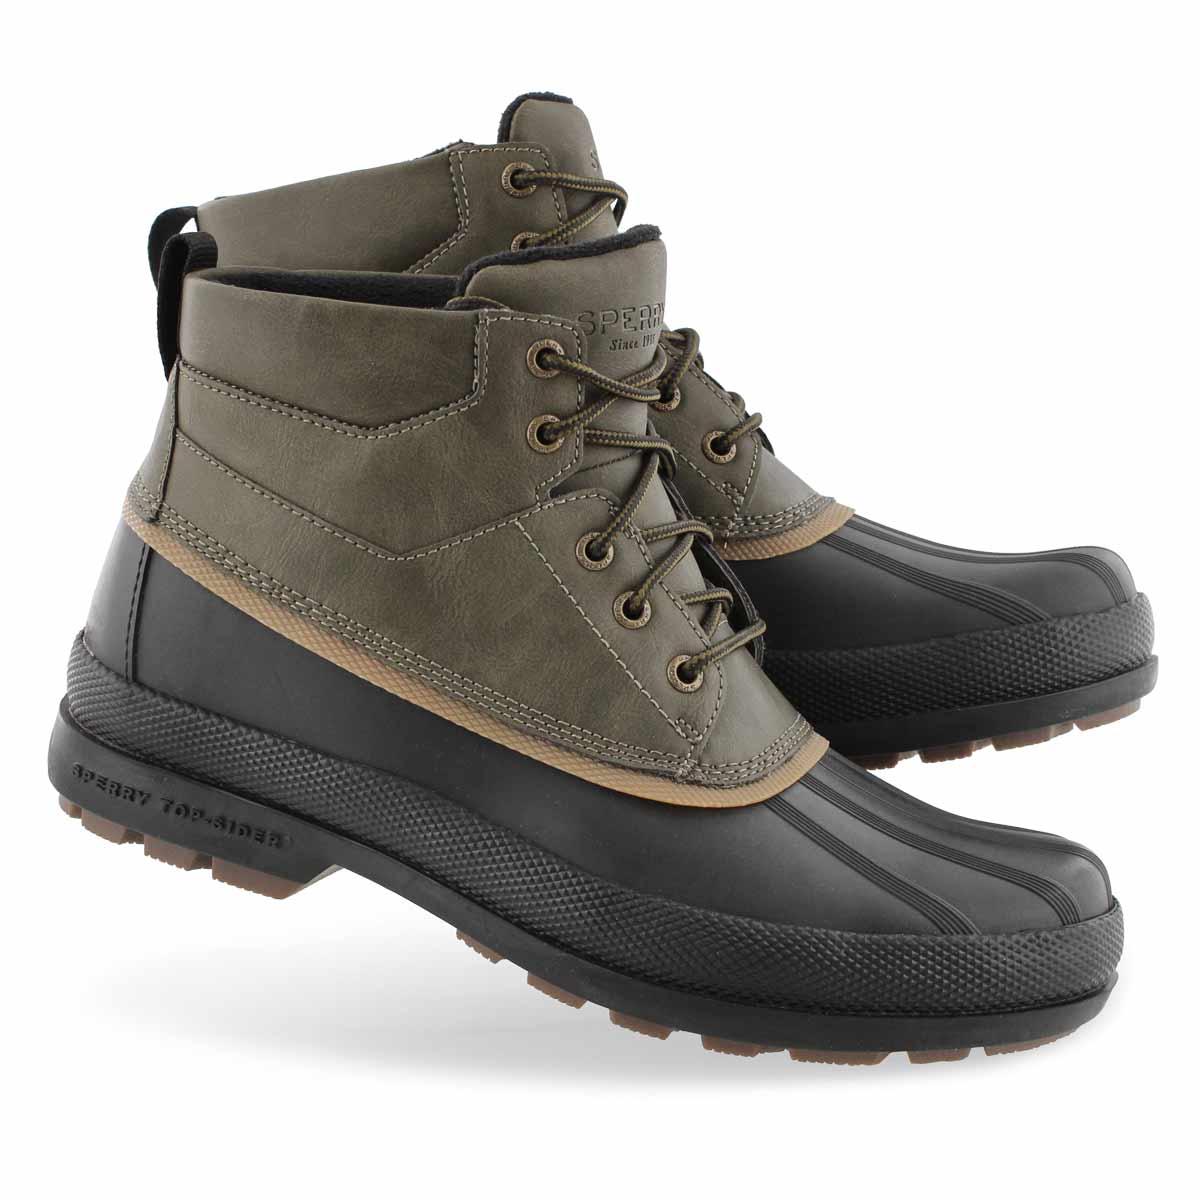 Mns Cold Bay Chukka olv/blk wtpf boot